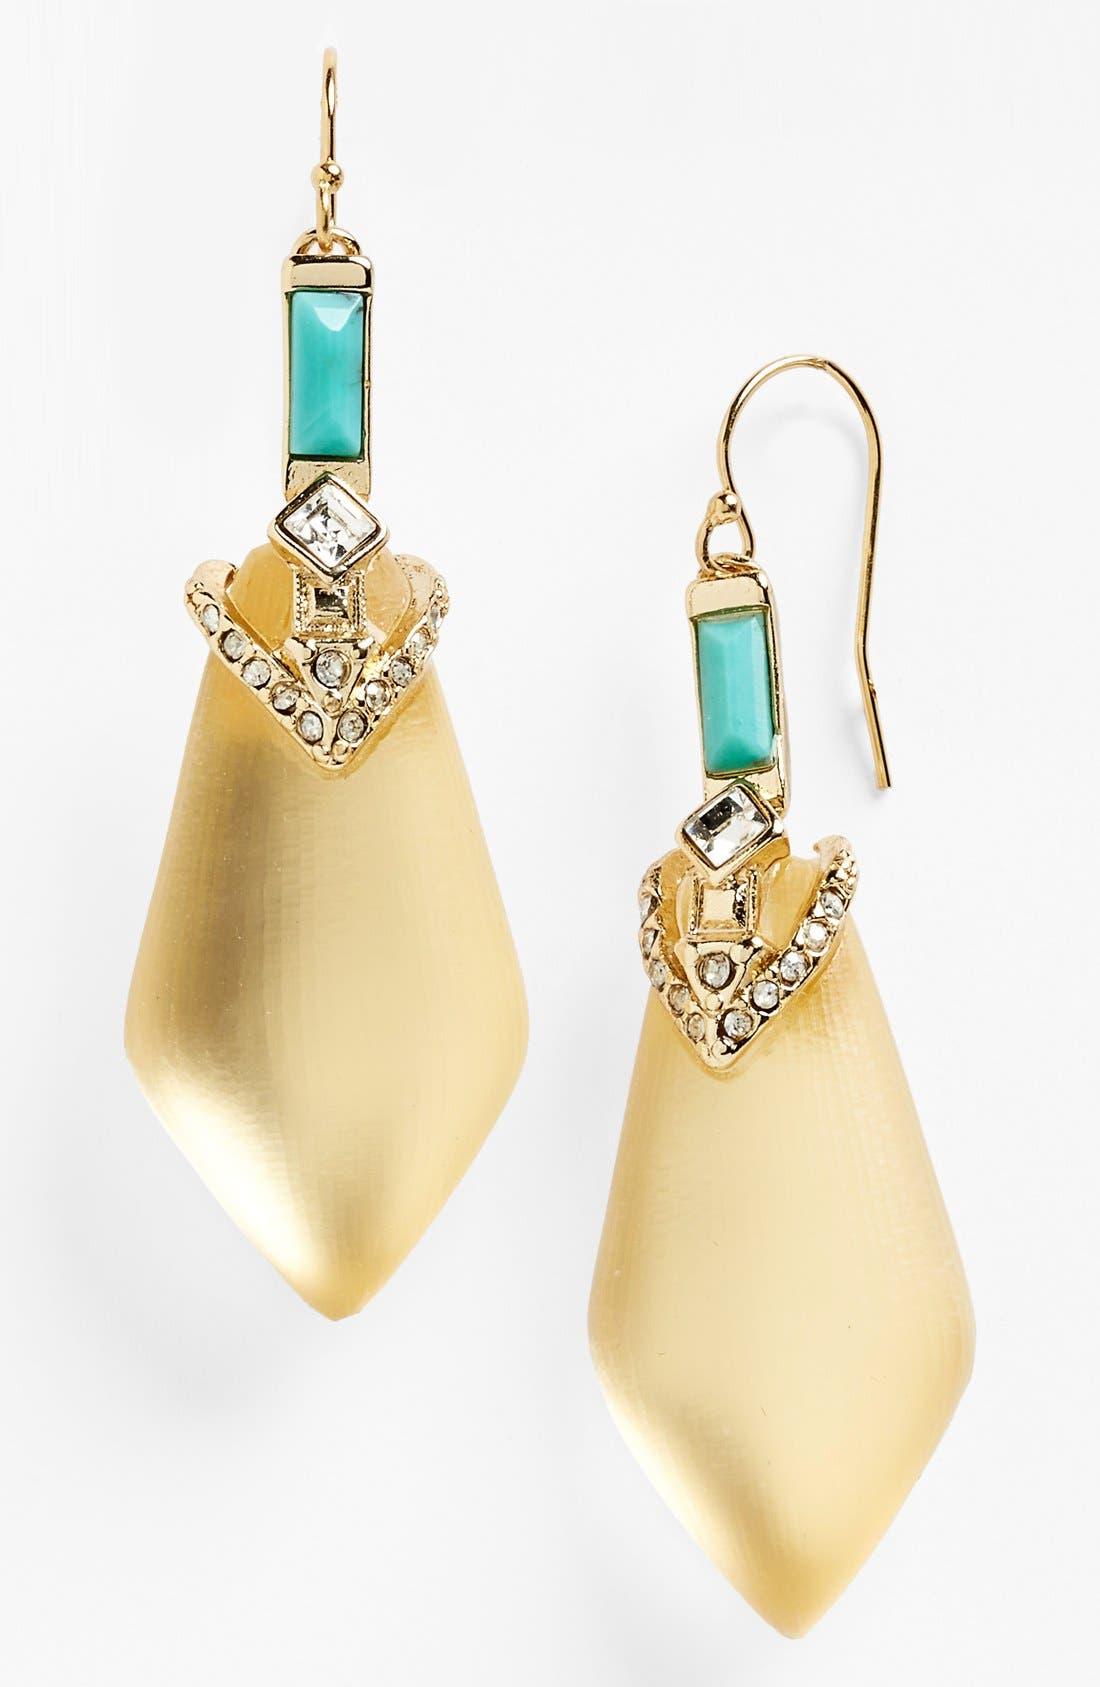 Main Image - Alexis Bittar 'Lucite®' Drop Earrings